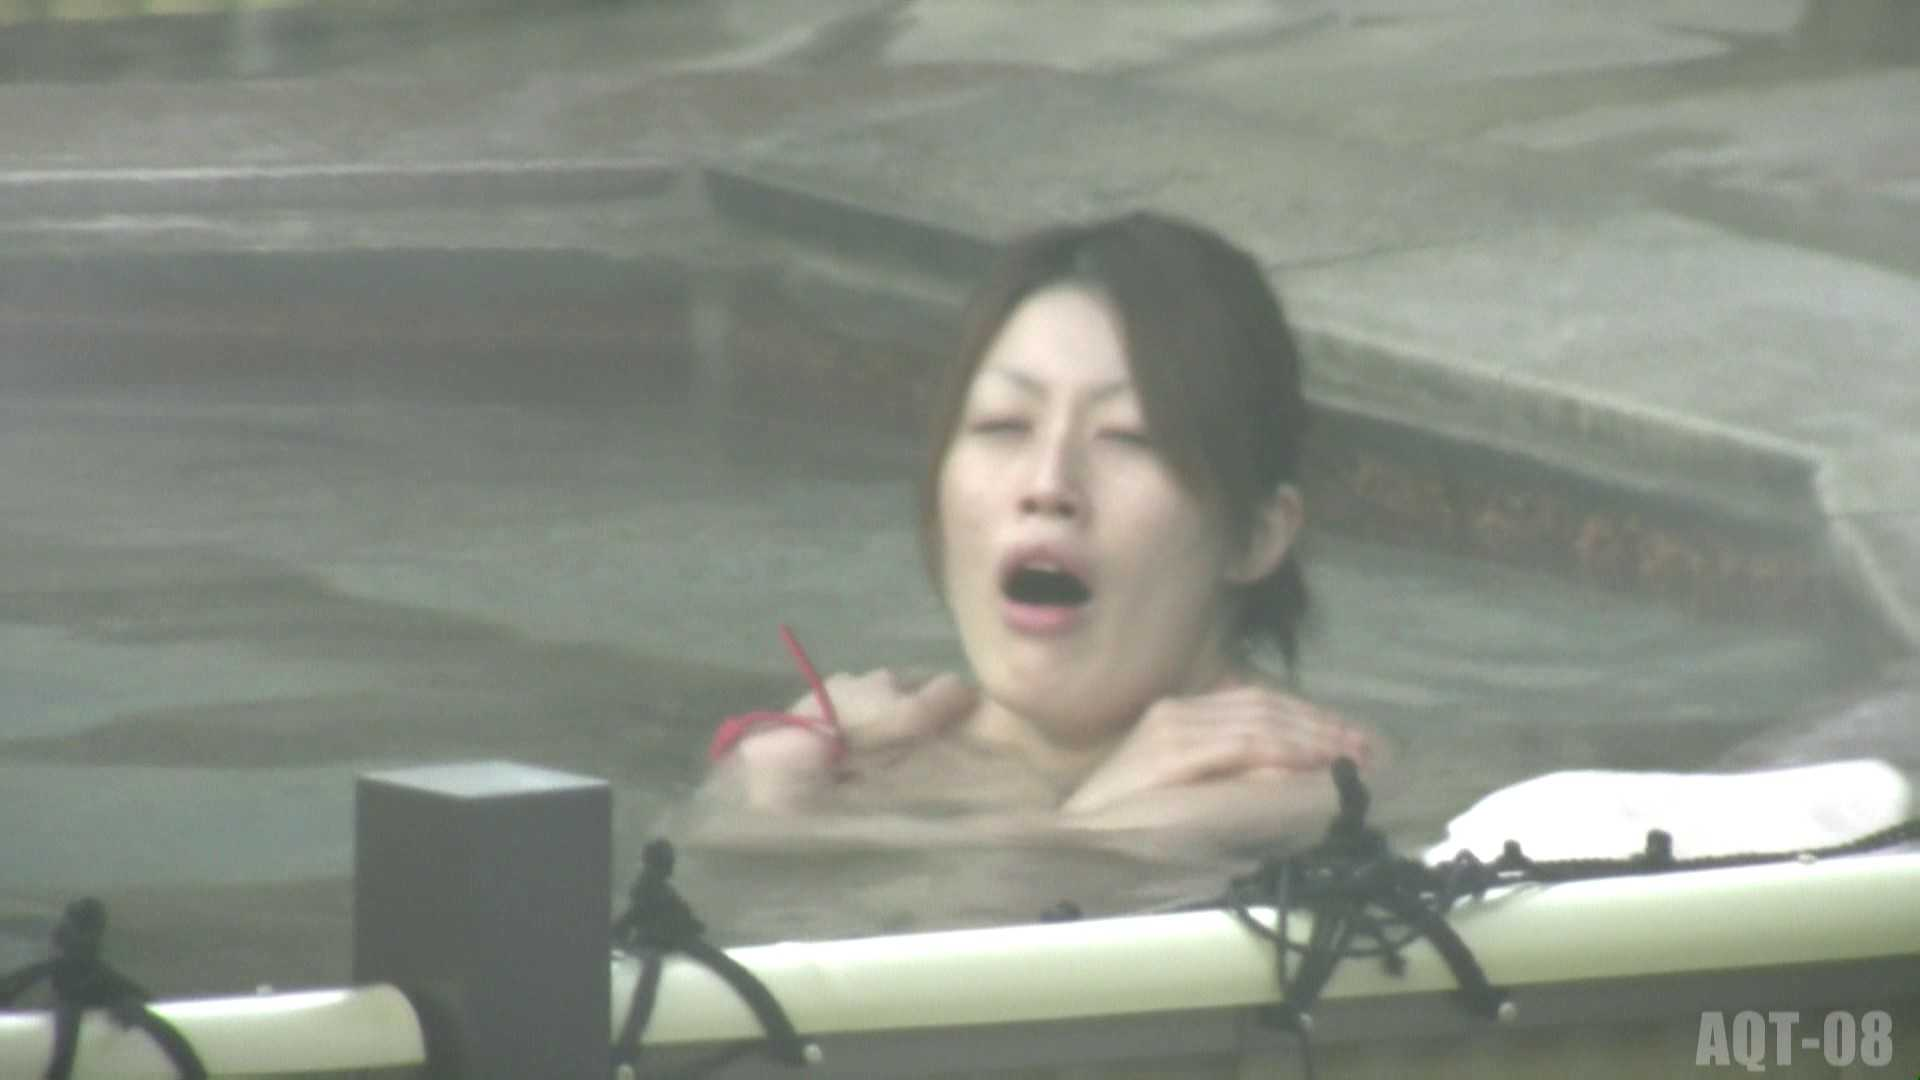 Aquaな露天風呂Vol.775 盗撮映像  74Pix 15